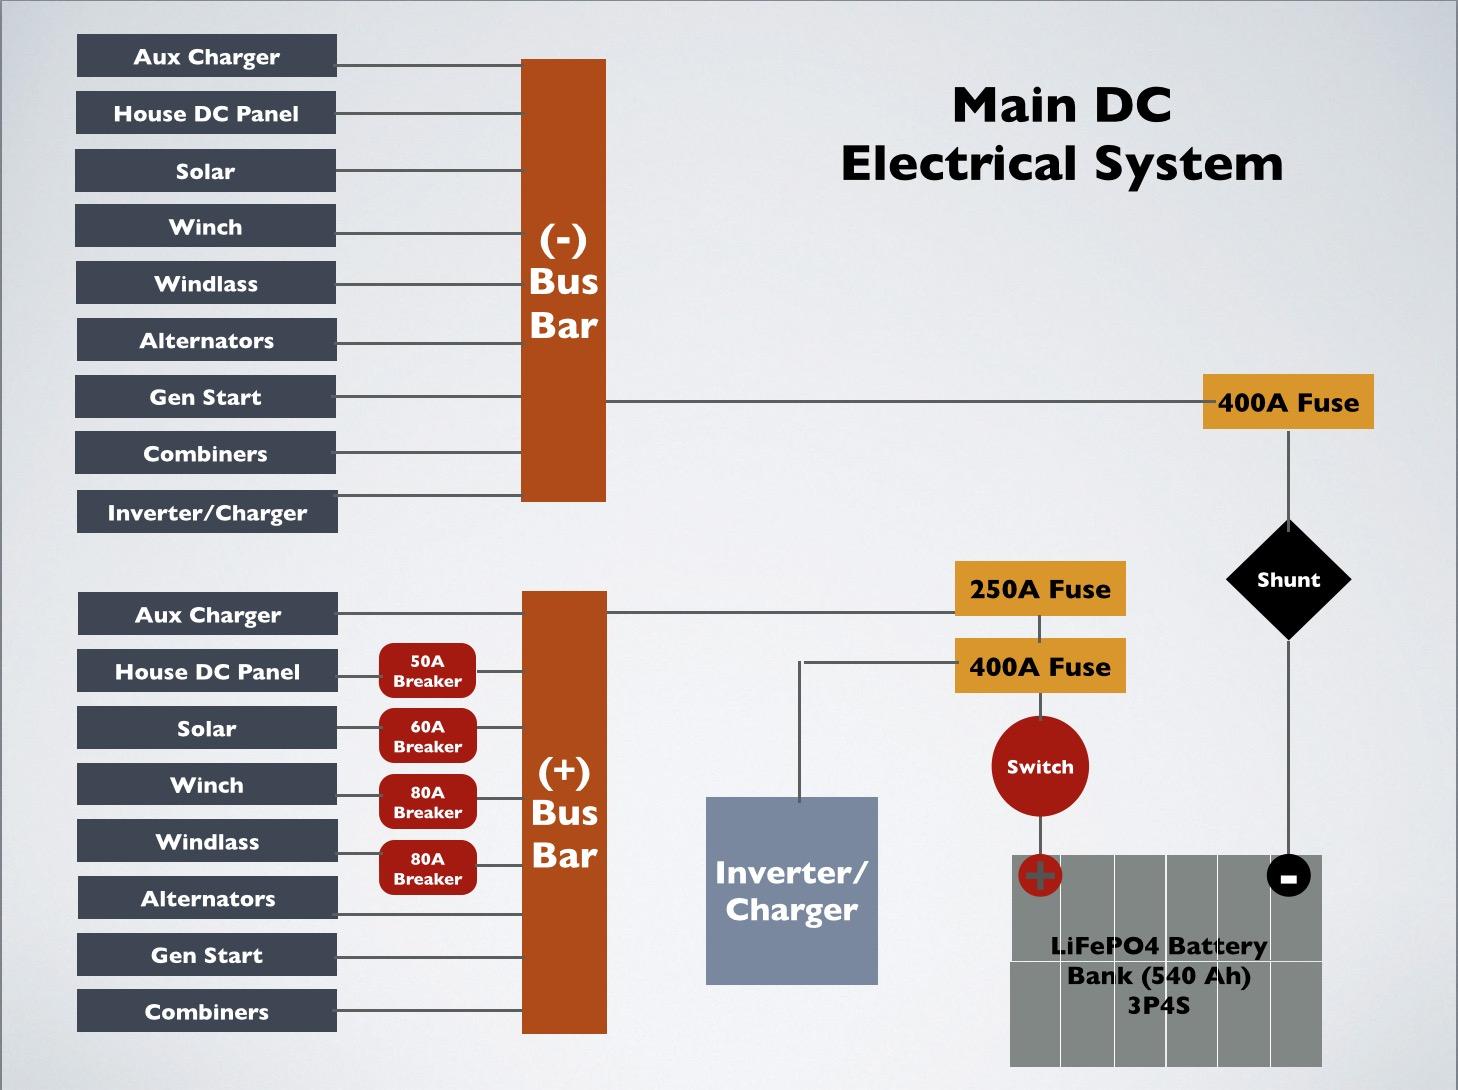 DC system